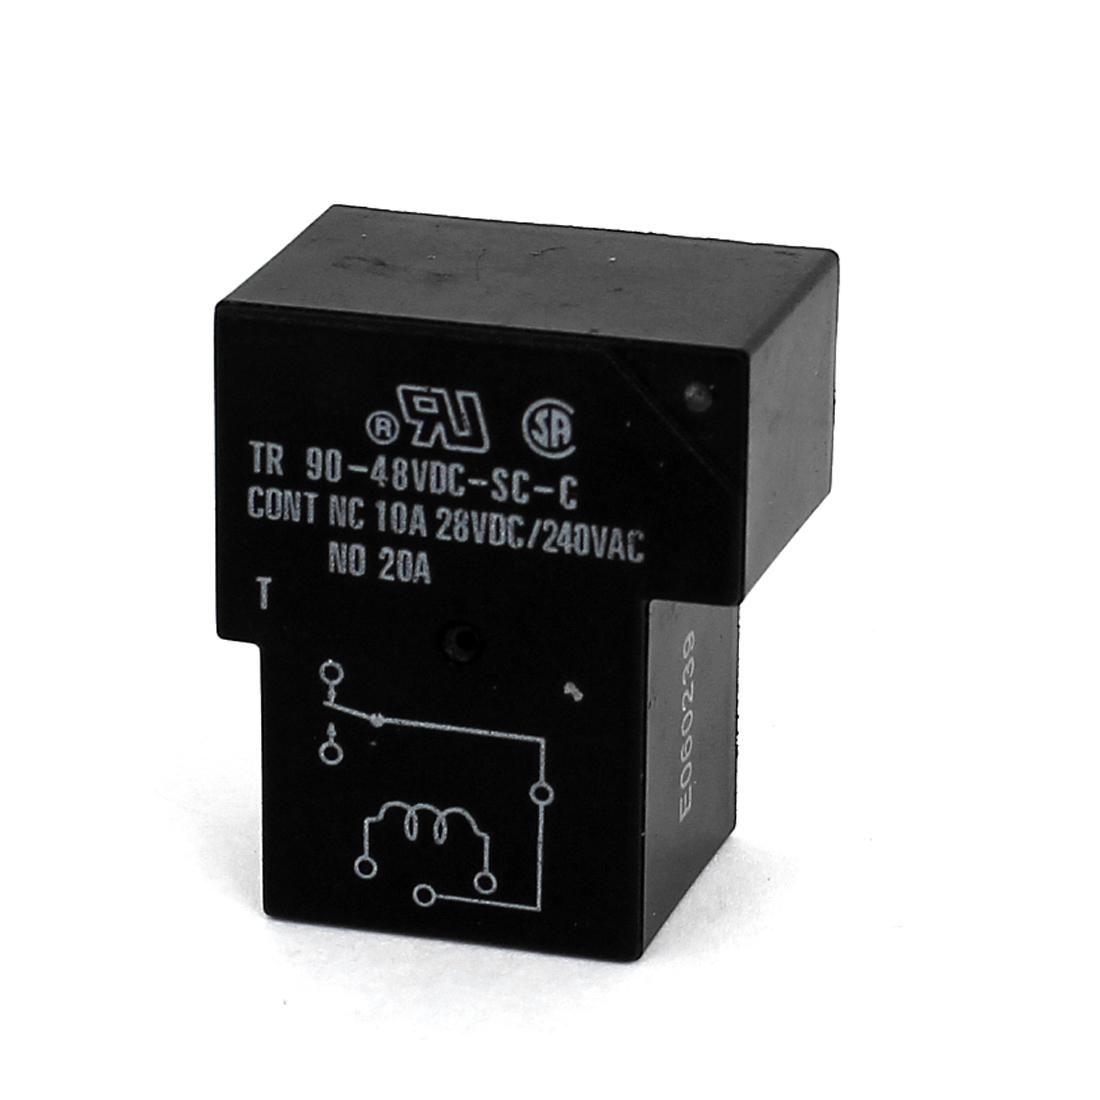 DC 48V Coil 6 Pins Terminal 1NO 1NC PCB Mount Electromagnetic Power Relays TR90-48VDC-SC-C